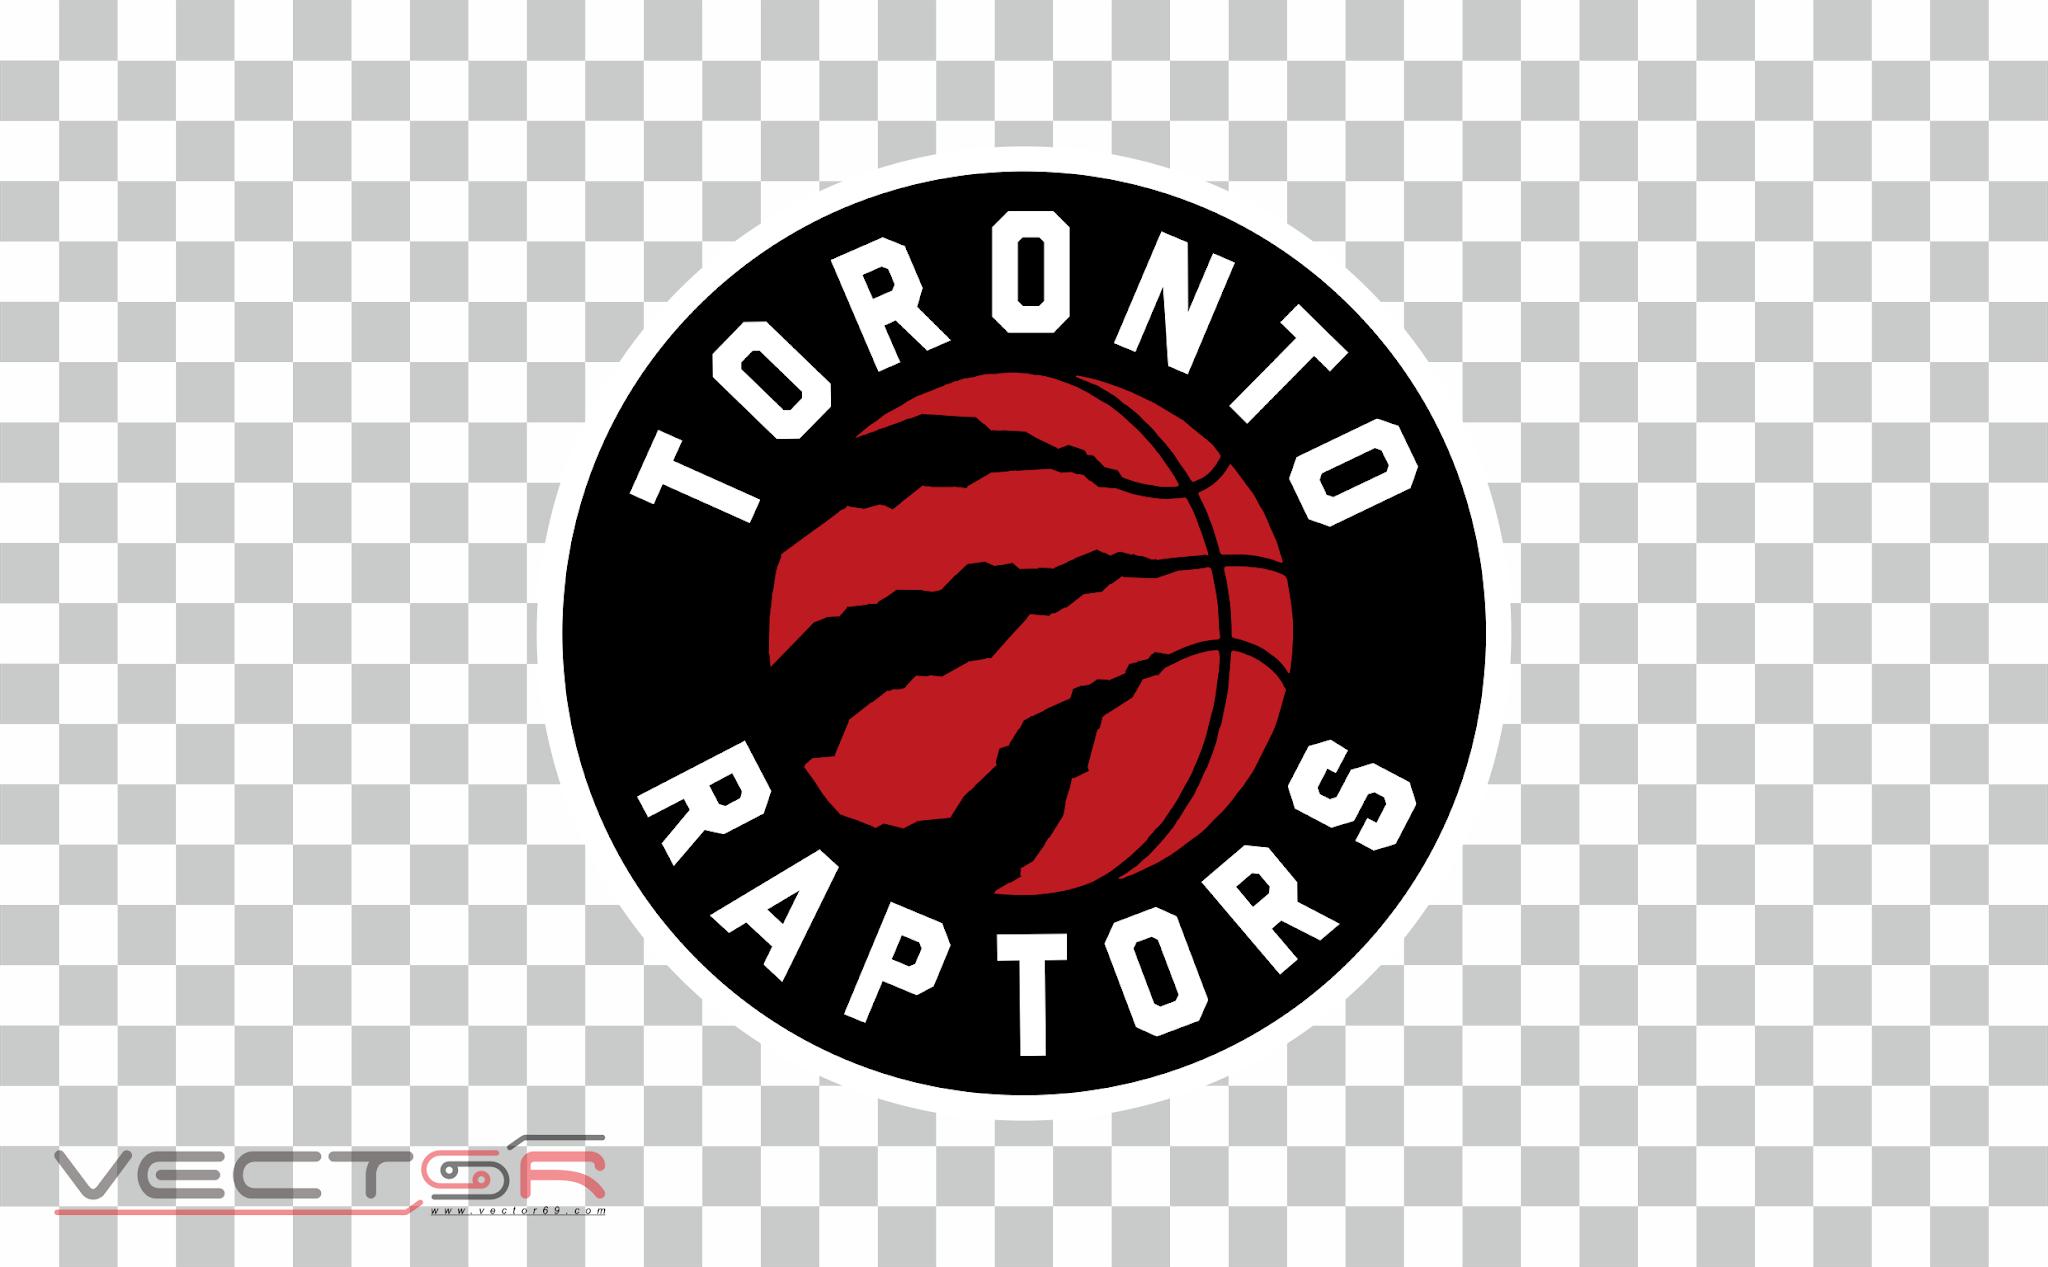 Toronto Raptors Logo - Download .PNG (Portable Network Graphics) Transparent Images